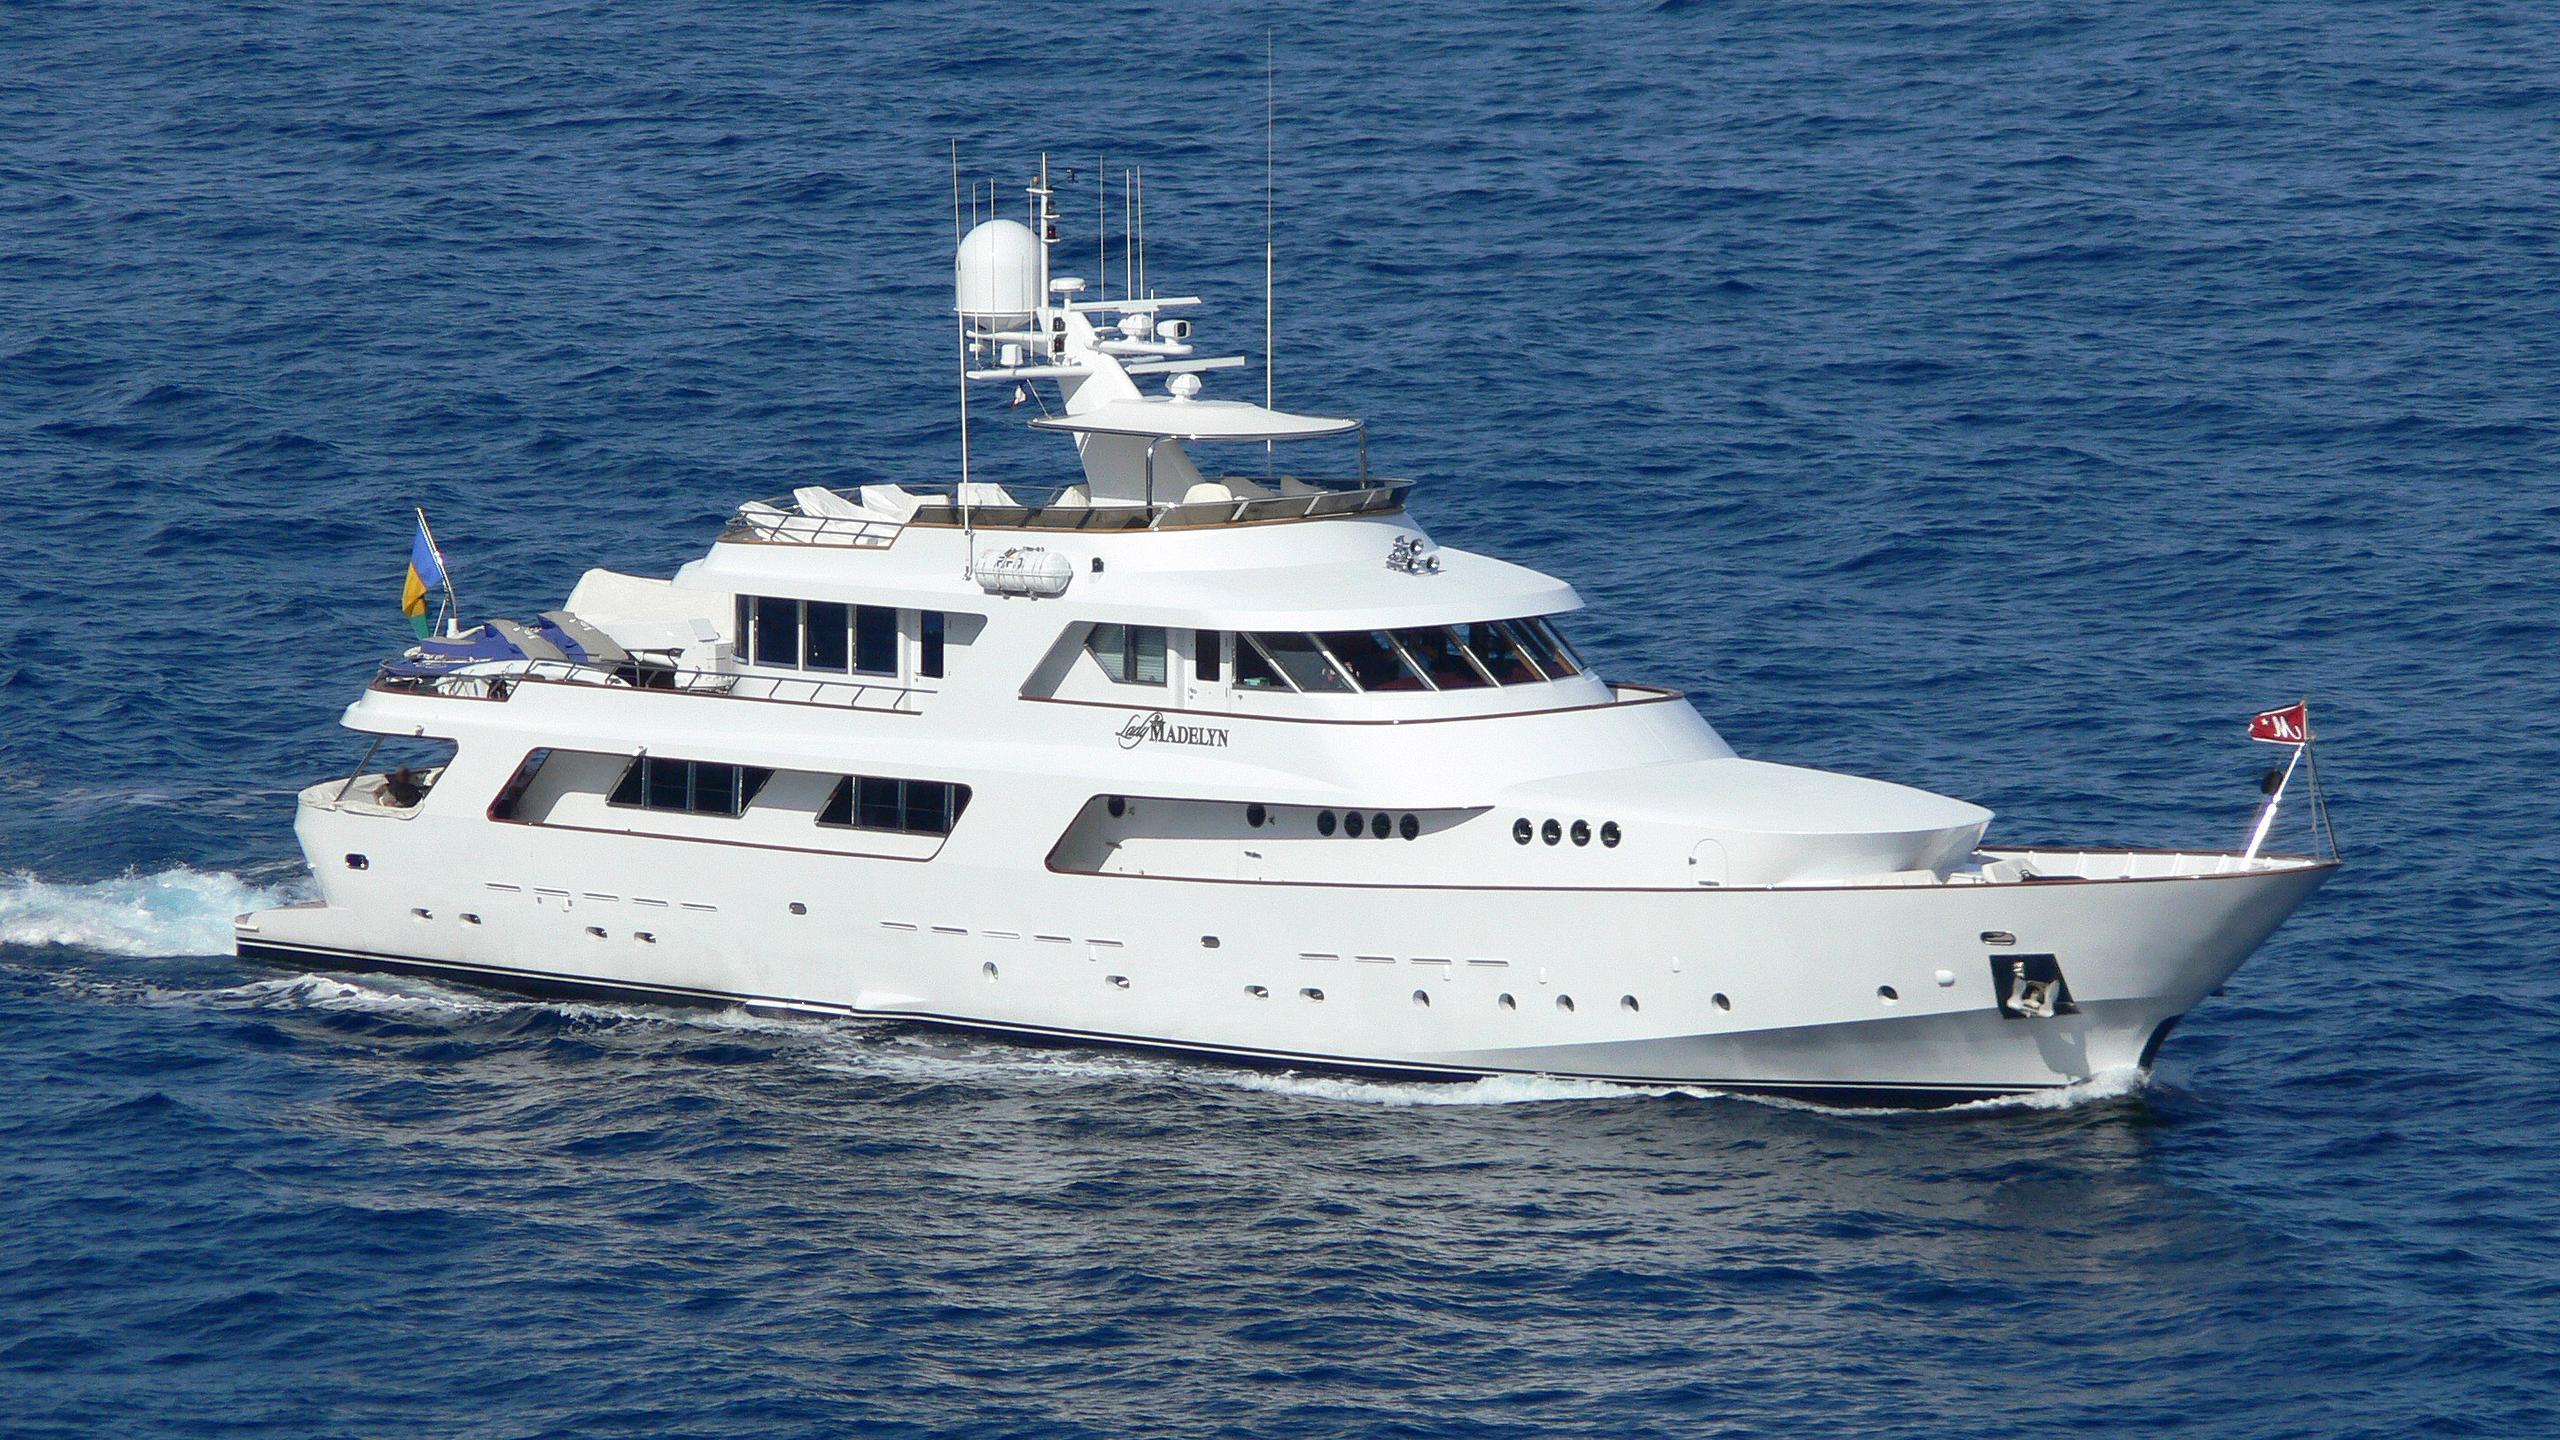 nordic-star-motor-yacht-crn-1978-37m-cruising